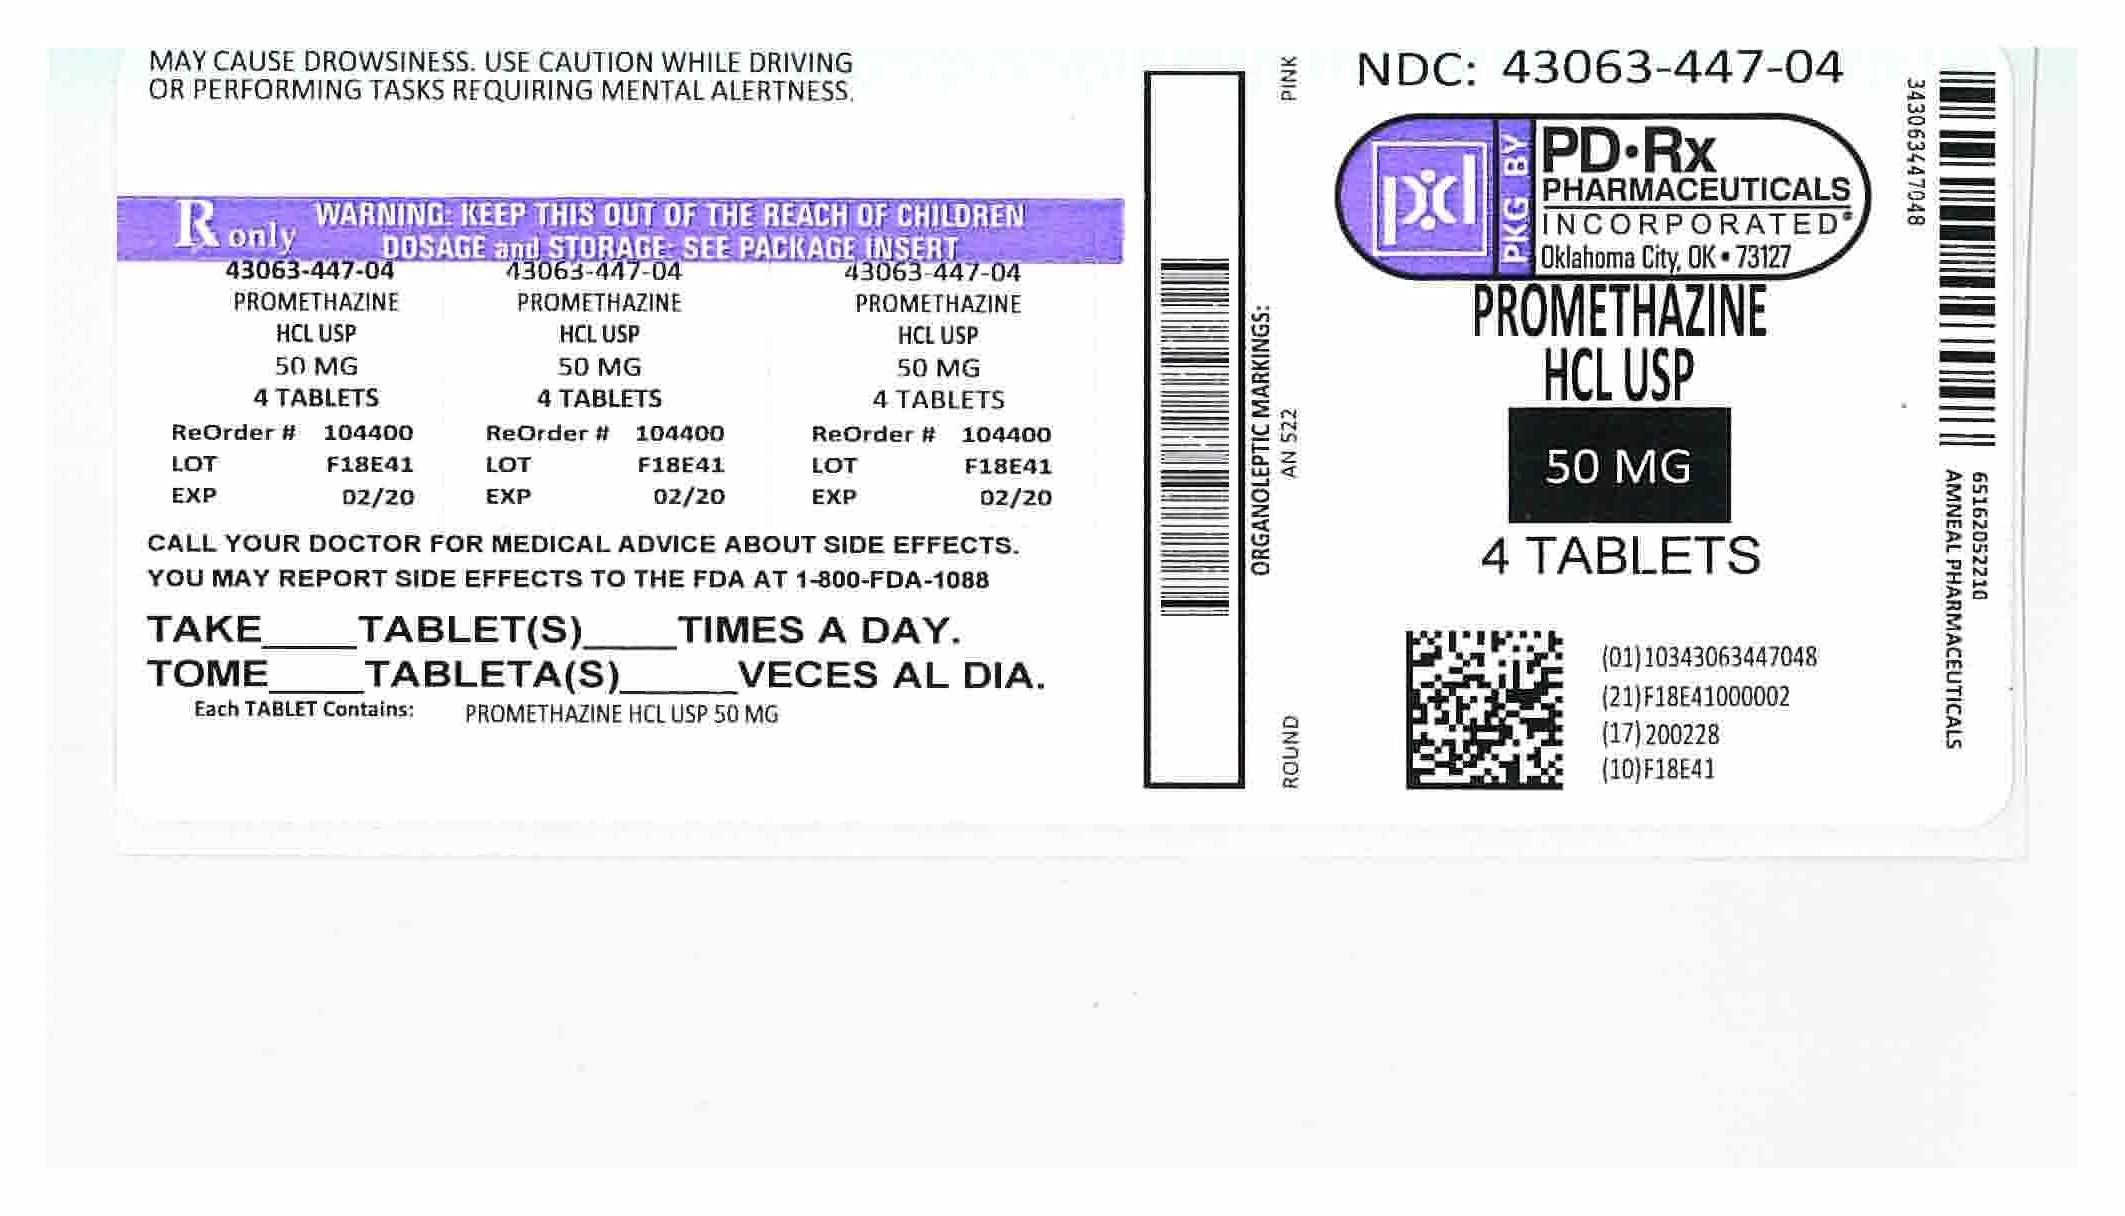 43063447 Label